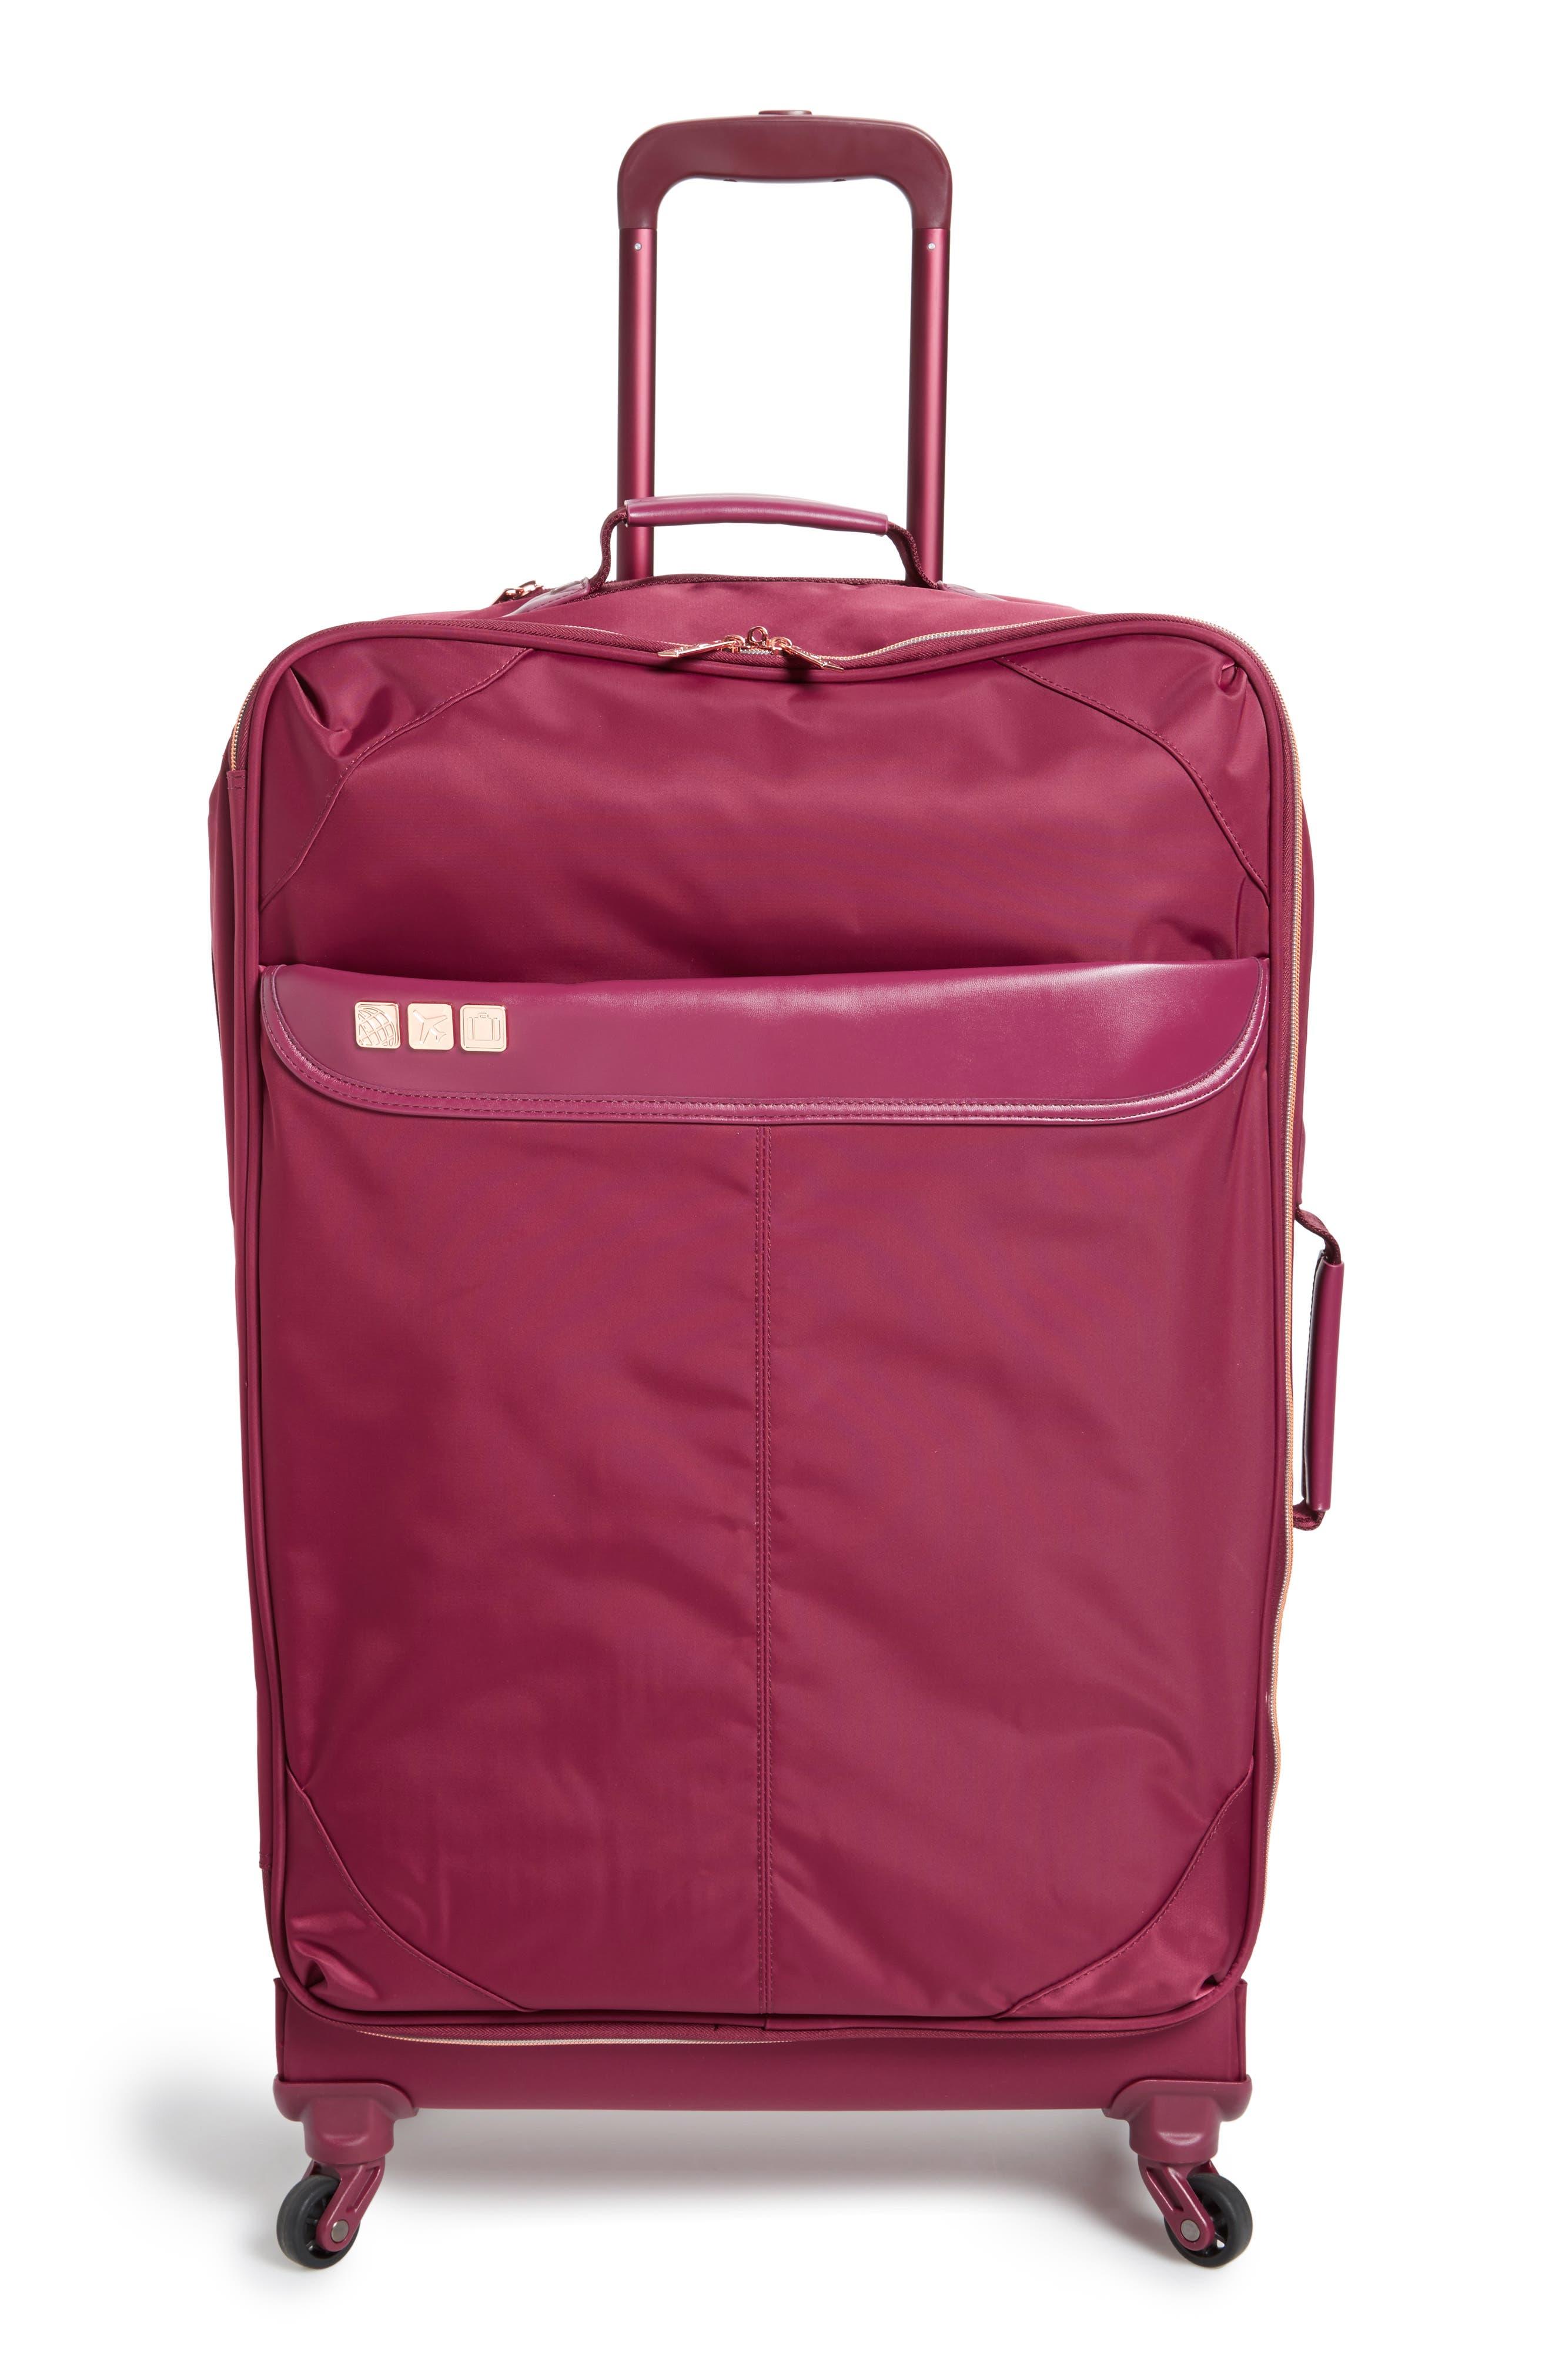 Avionette 26-Inch Rolling Suitcase,                             Main thumbnail 1, color,                             930